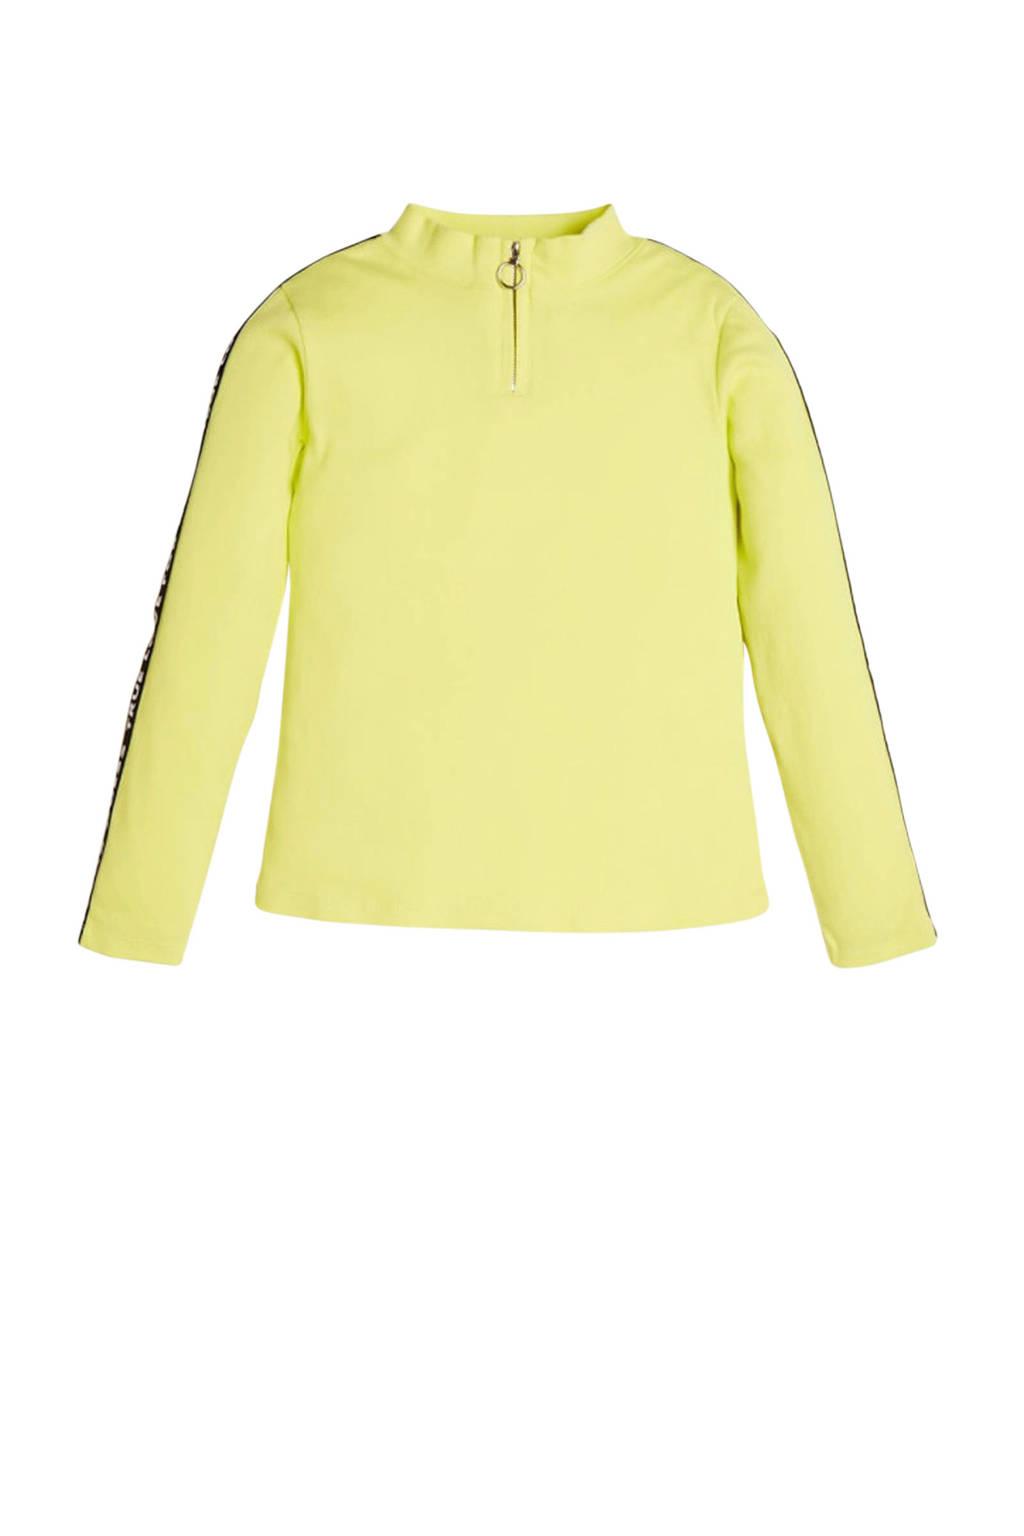 GUESS top Rib LS T-shirt groengeel